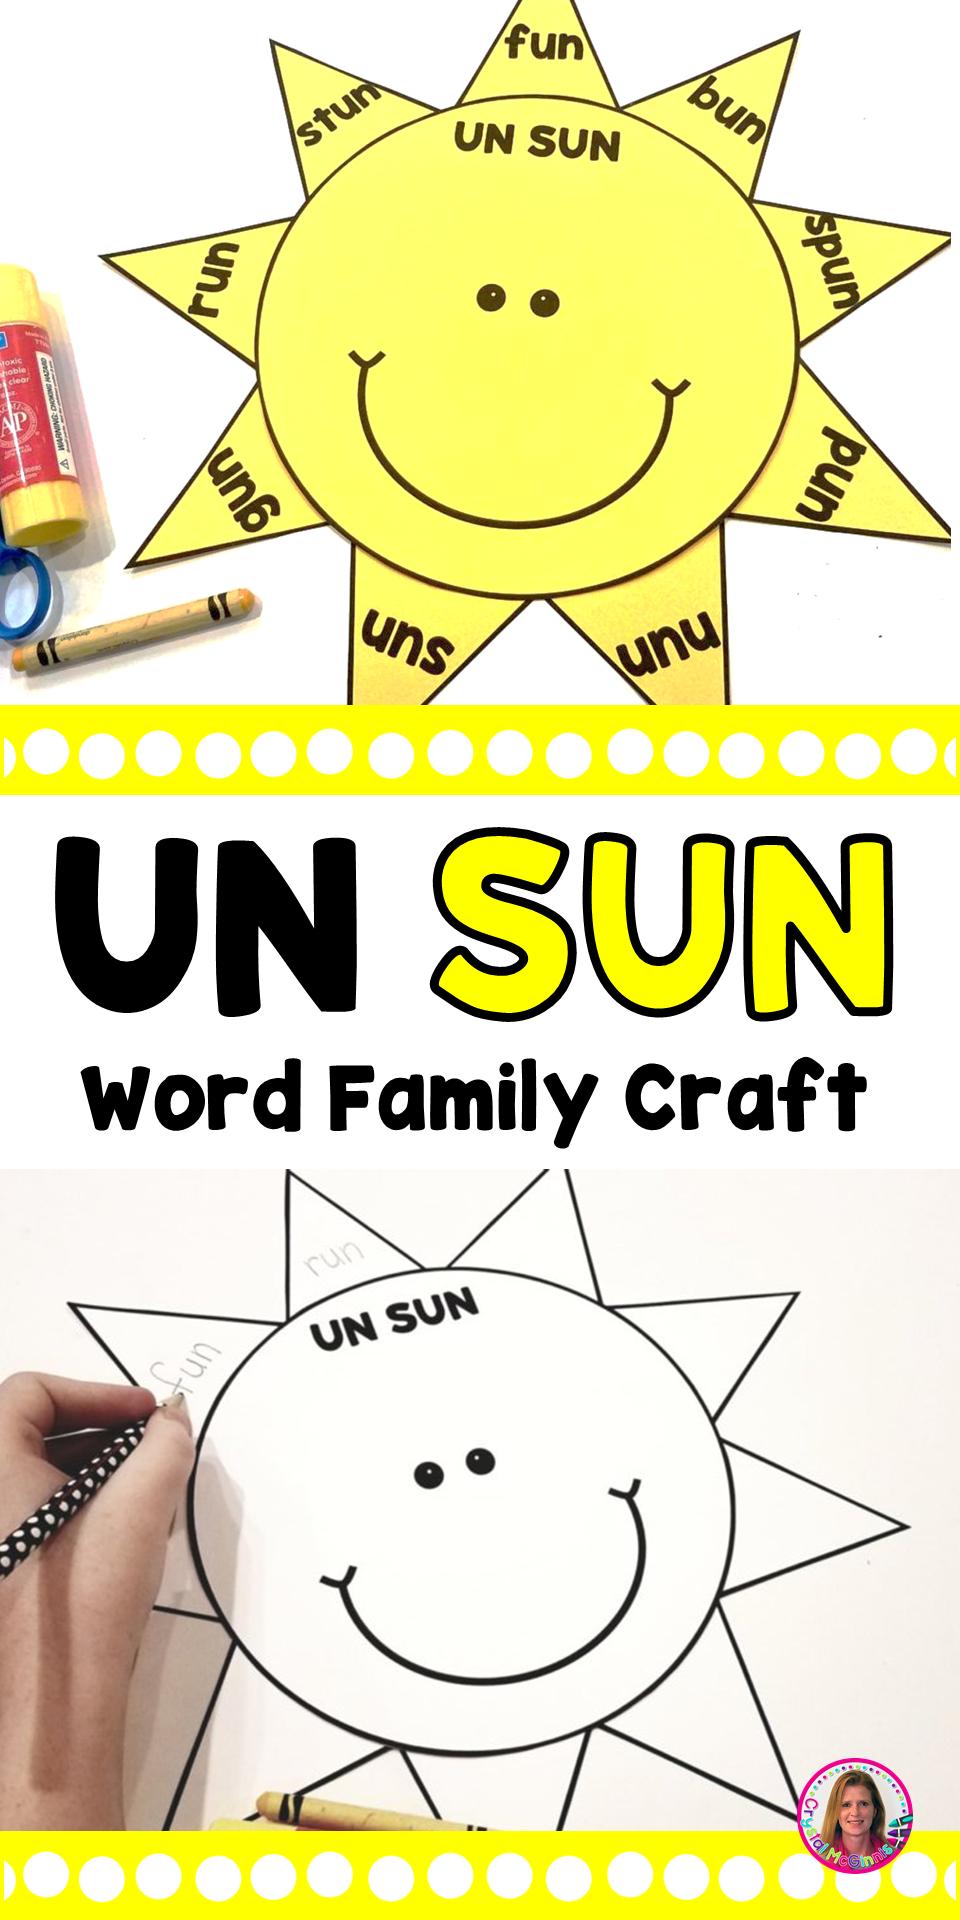 Un Sun Word Family Craft Word Families Kindergarten Word Families Word Family Activities [ 1920 x 960 Pixel ]